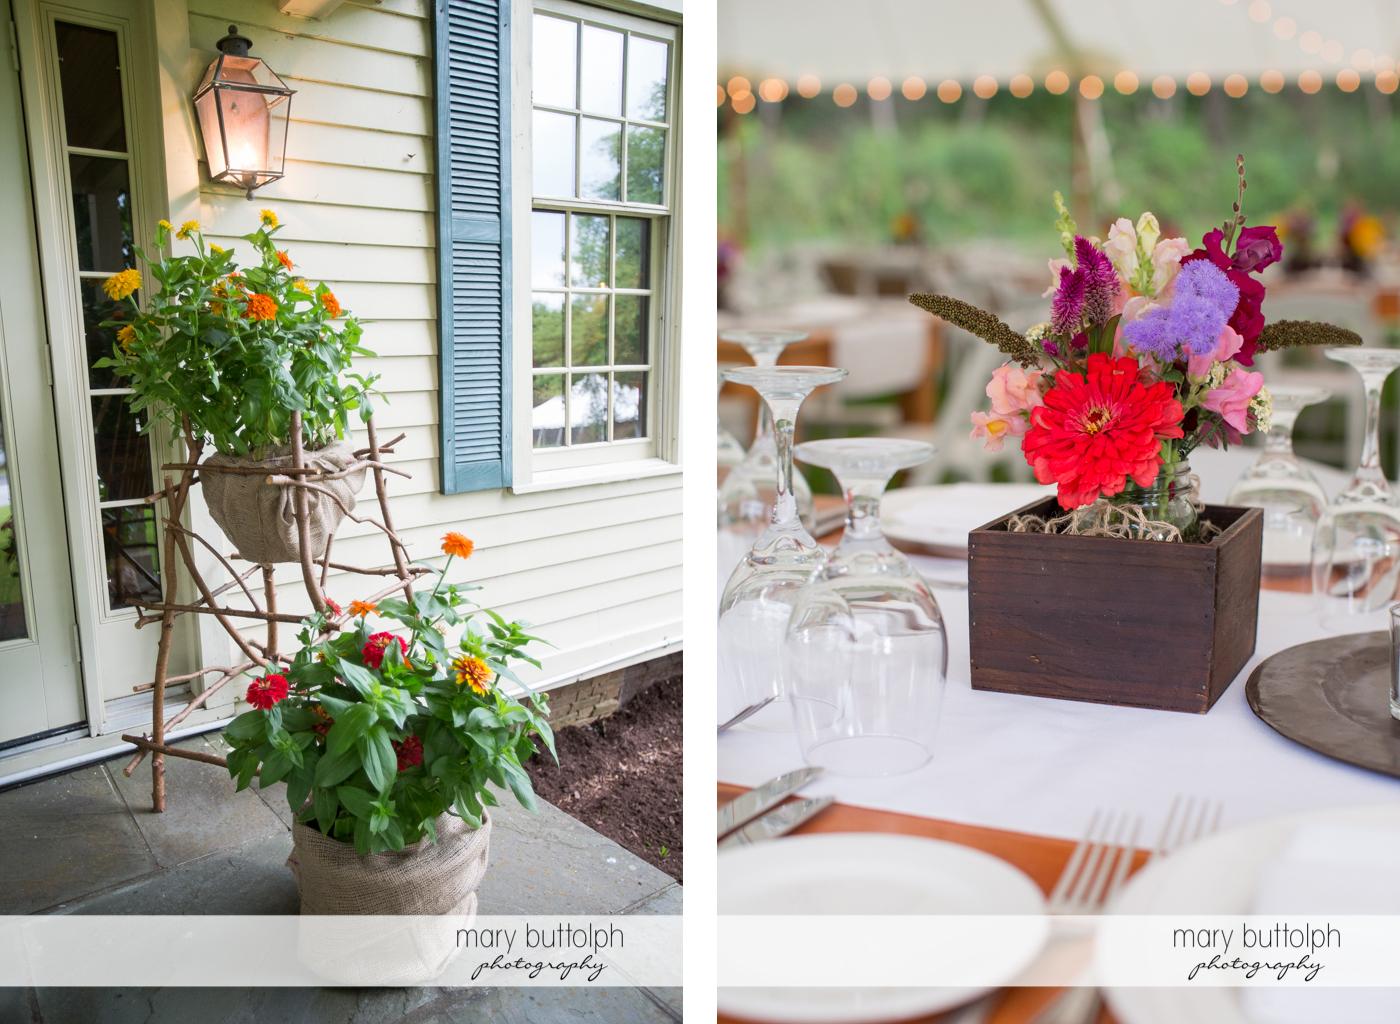 Beautiful flowers decorate the wedding venue at the Hamilton Inn Wedding